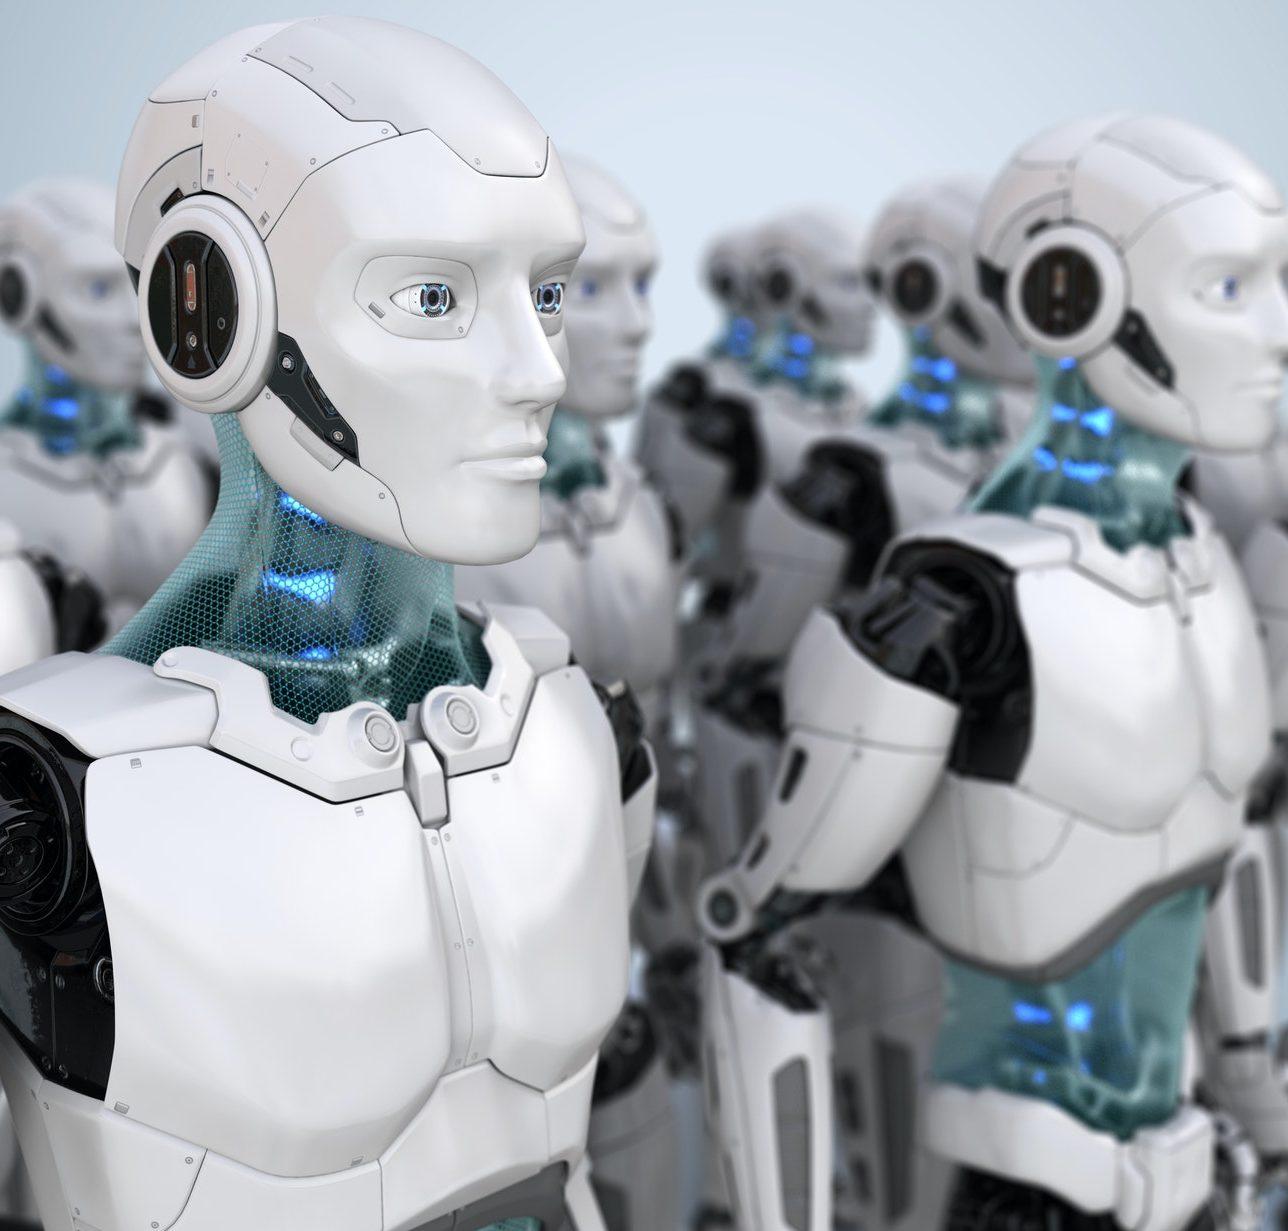 Crowd of robots